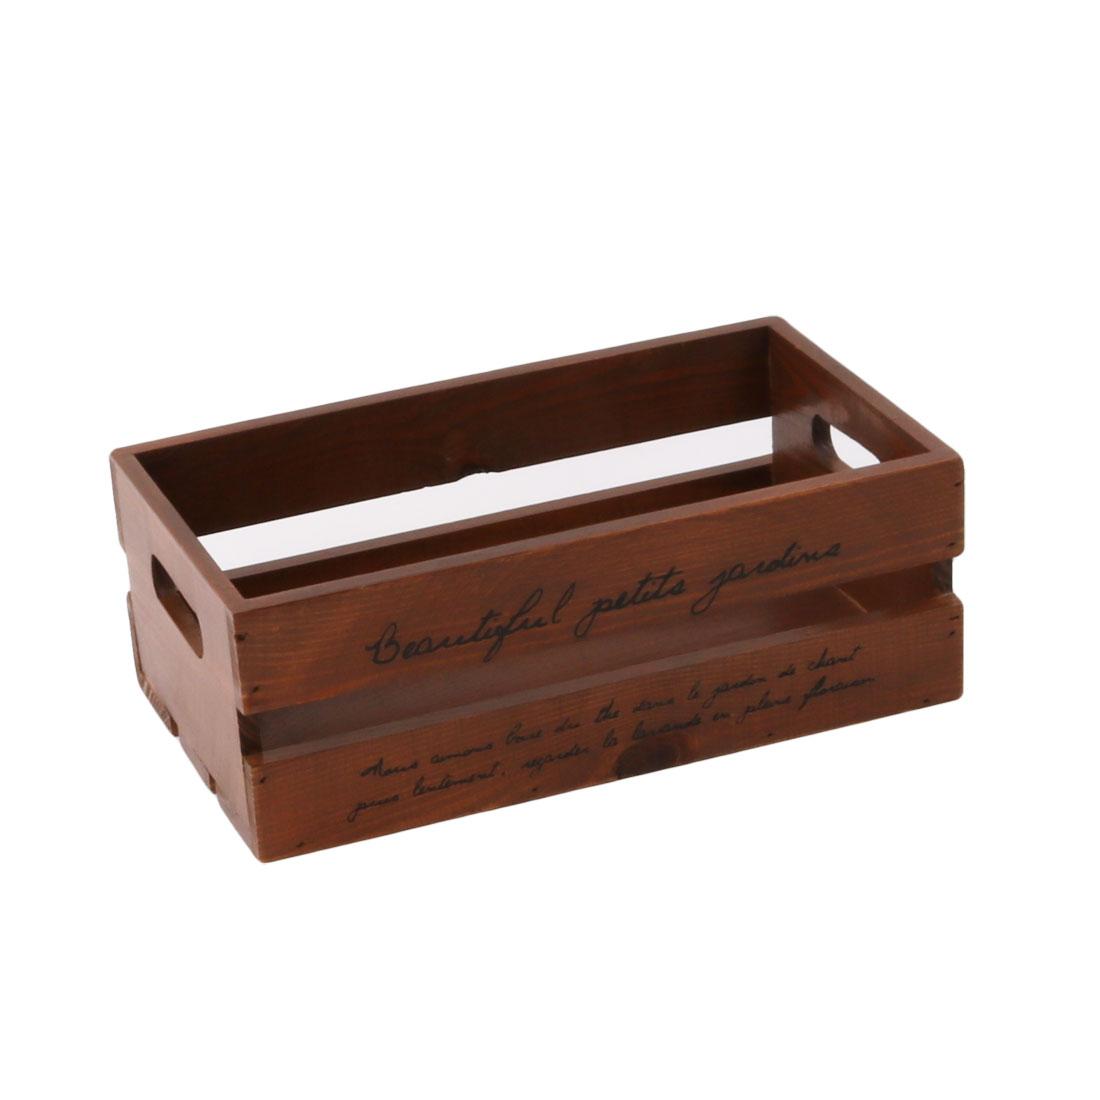 Hollow Out Design Remote Control Postcard Stationery Storage Organizer Box Brown